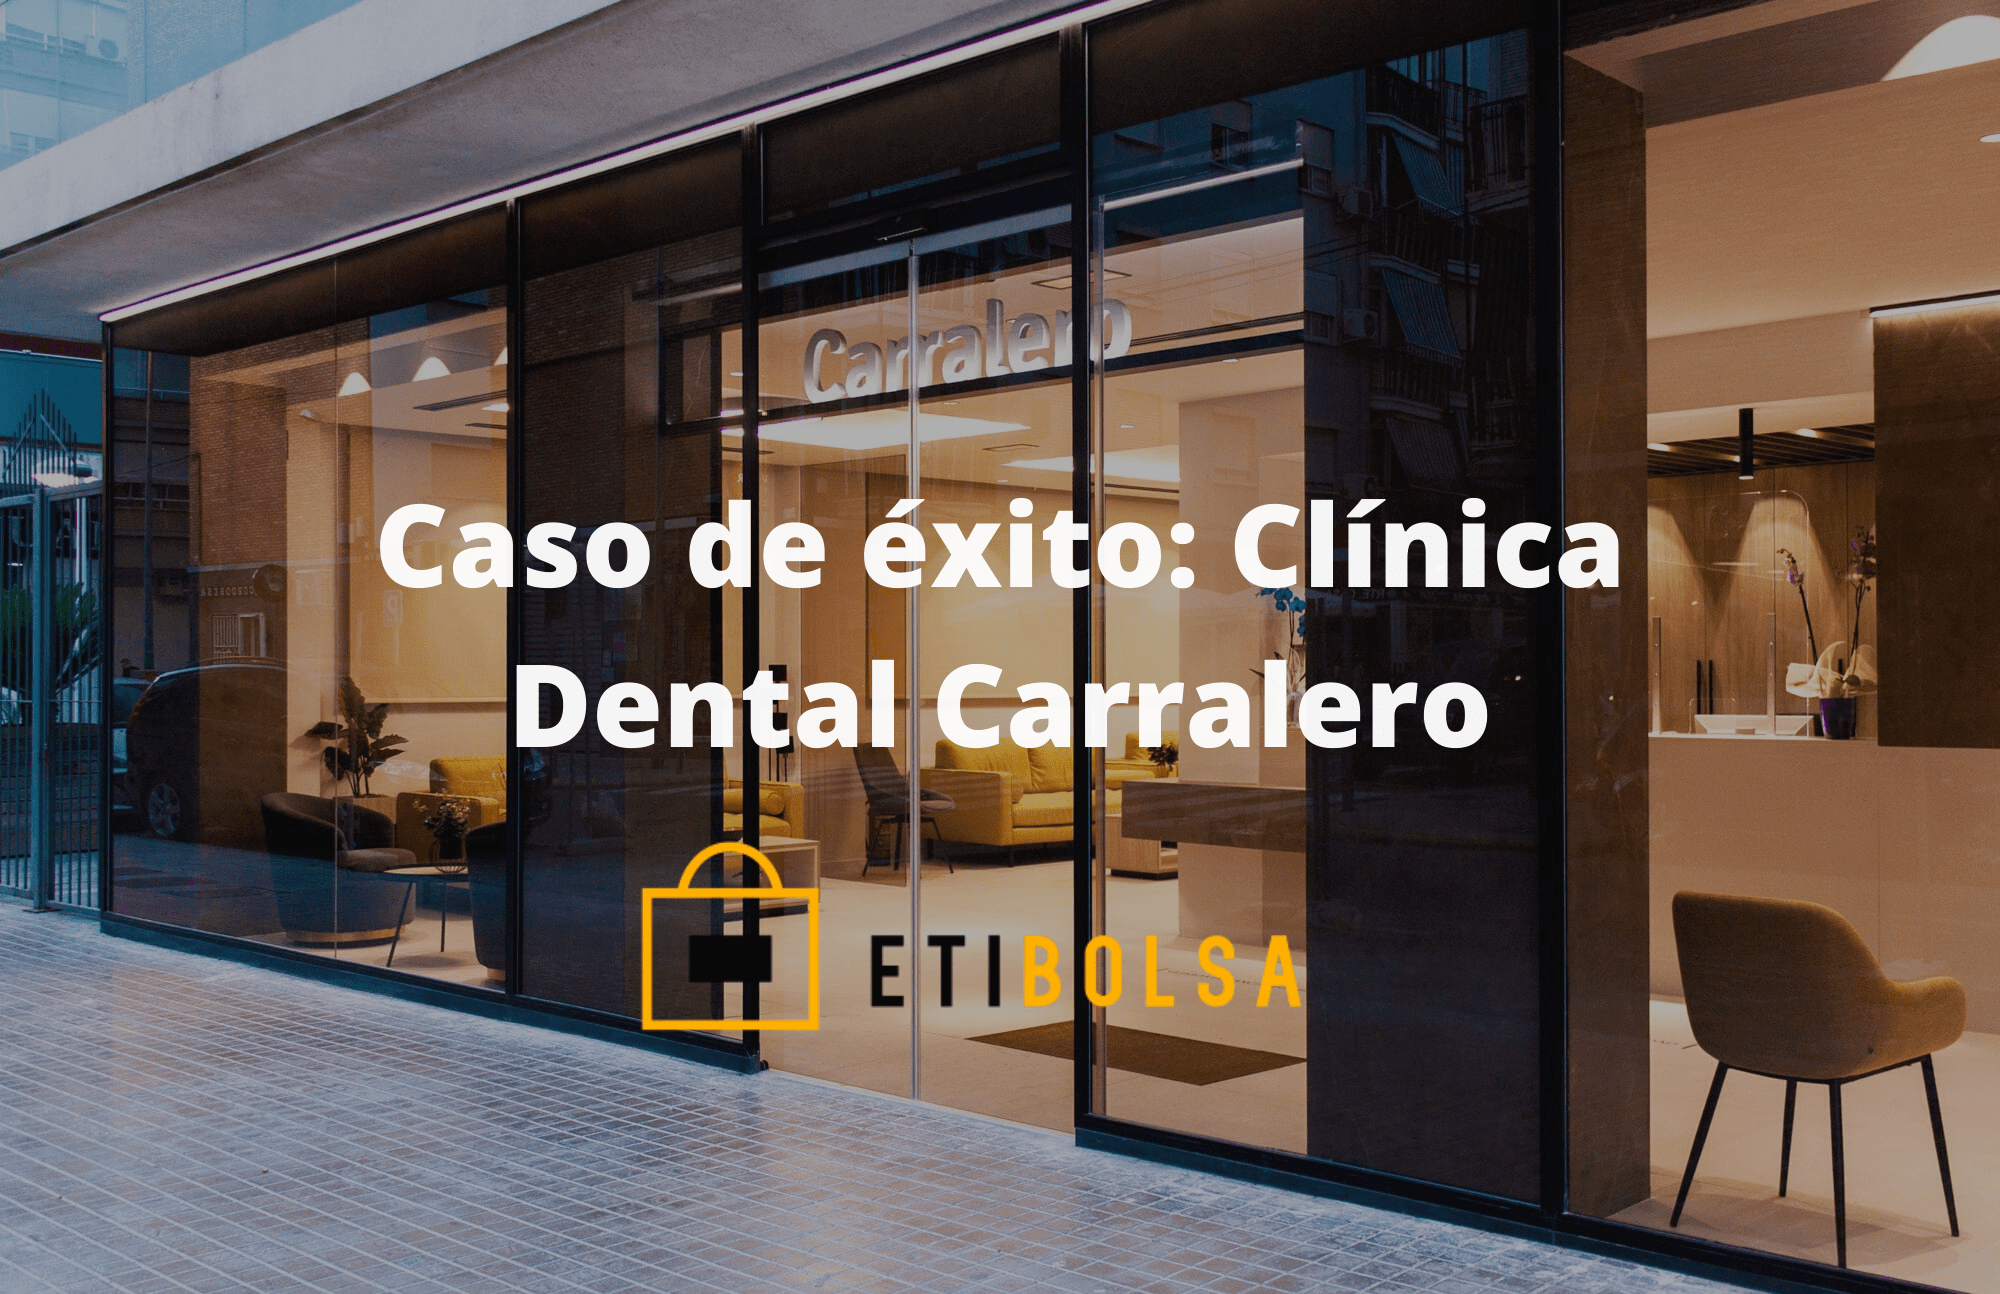 Clinica dental carralero